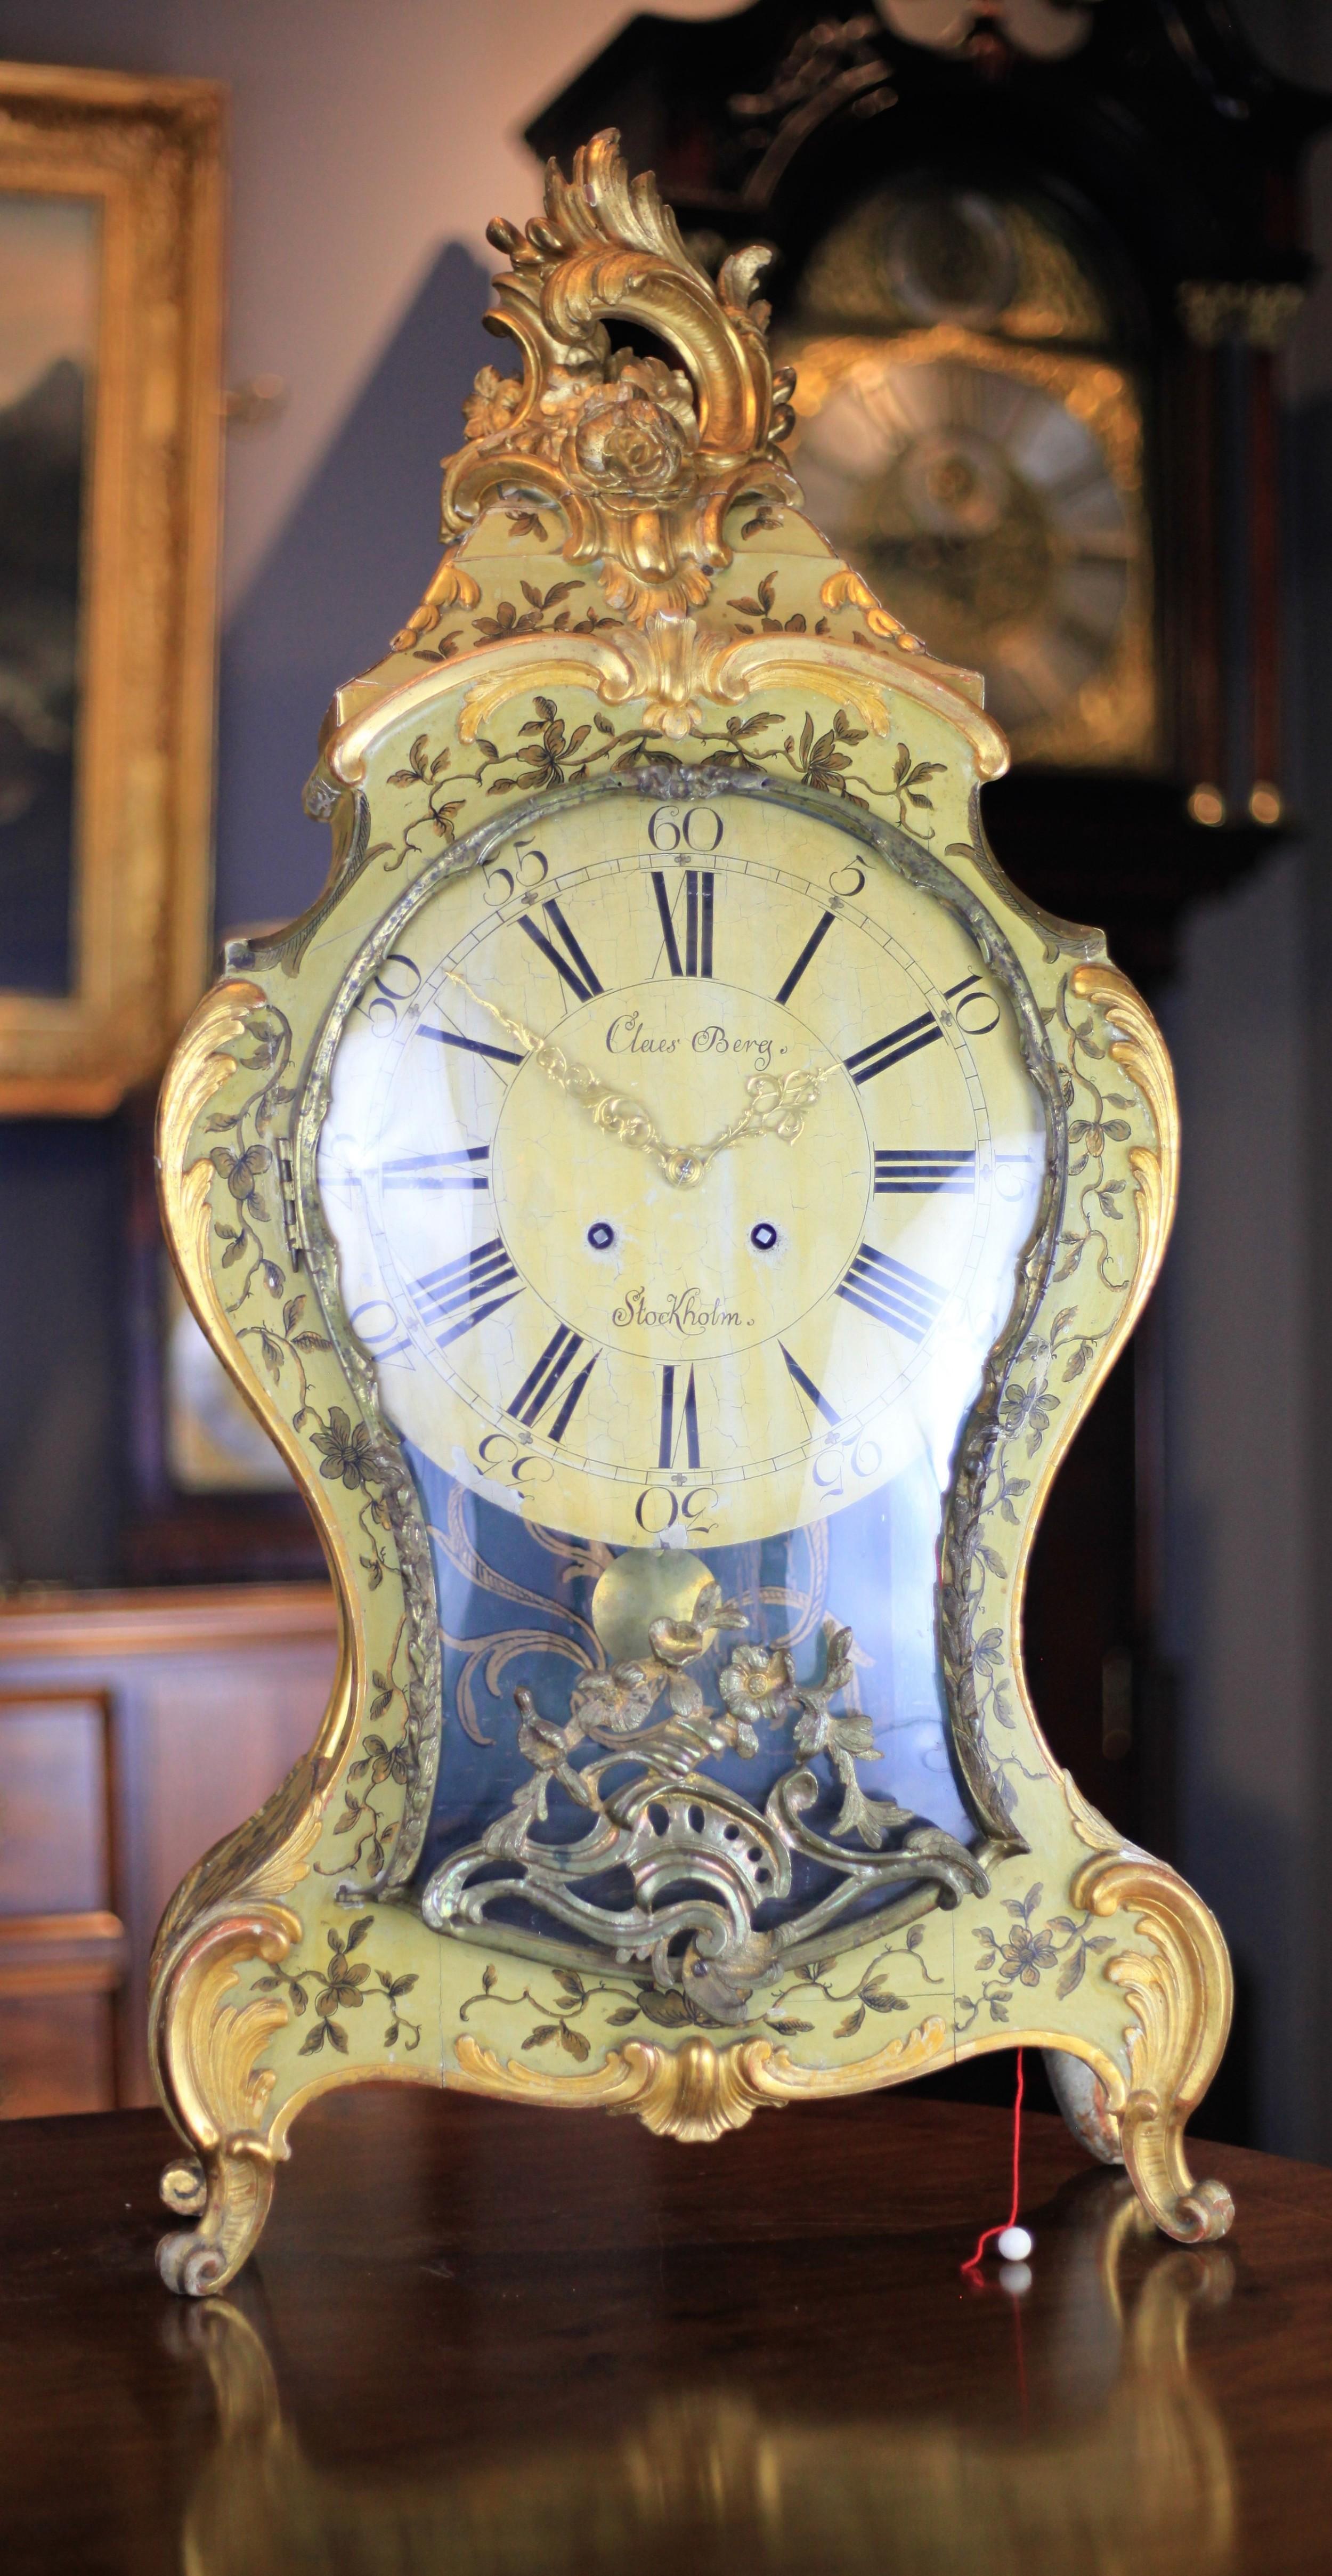 a rare mid 18th century swedish vernis martin bracket clock by claes berg stockholm c1750